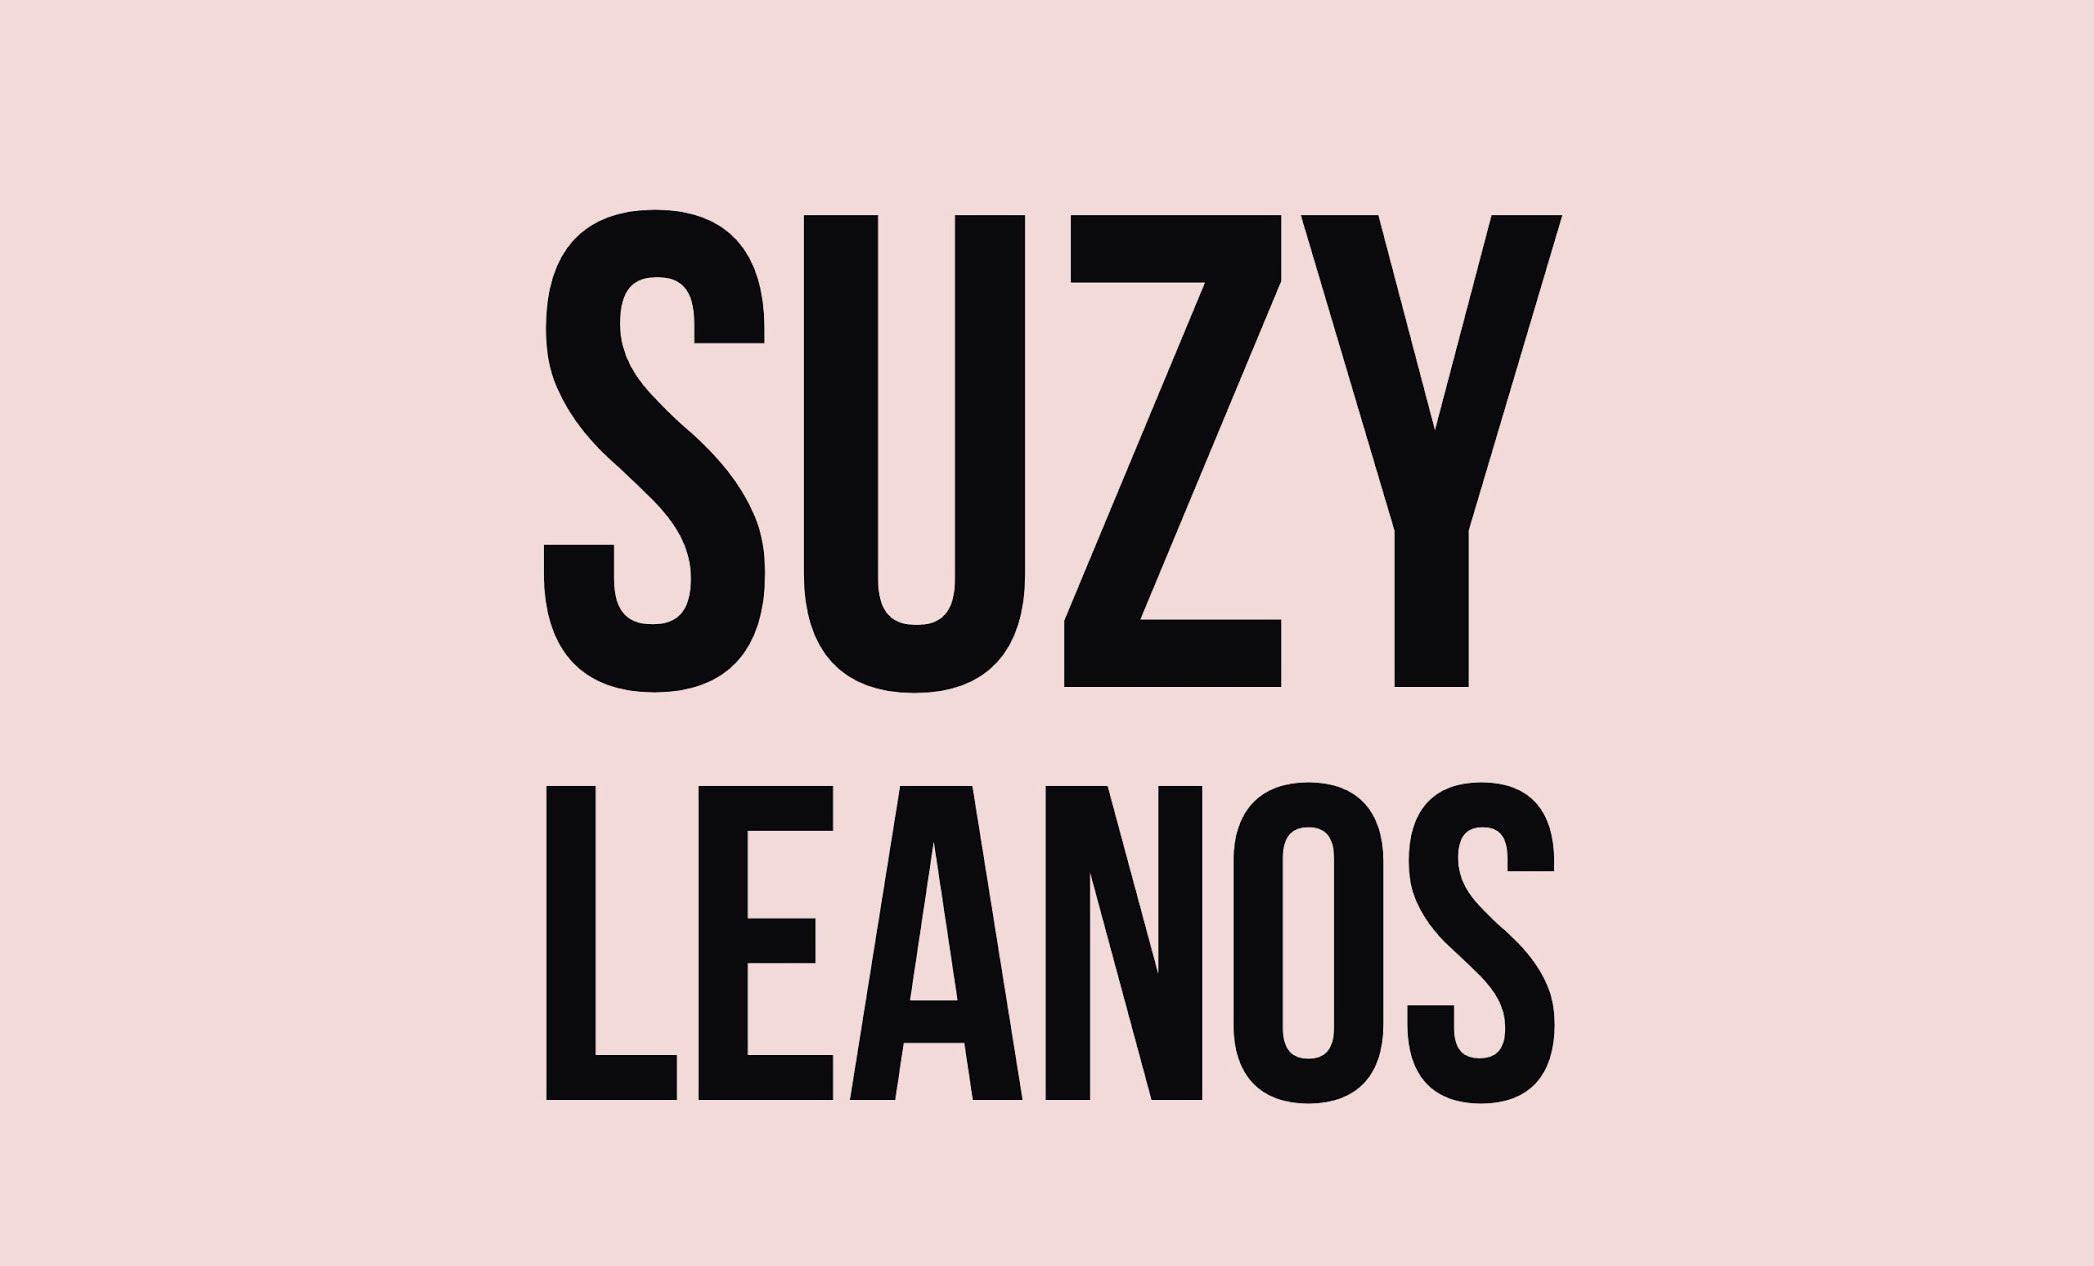 Suzy Leanos